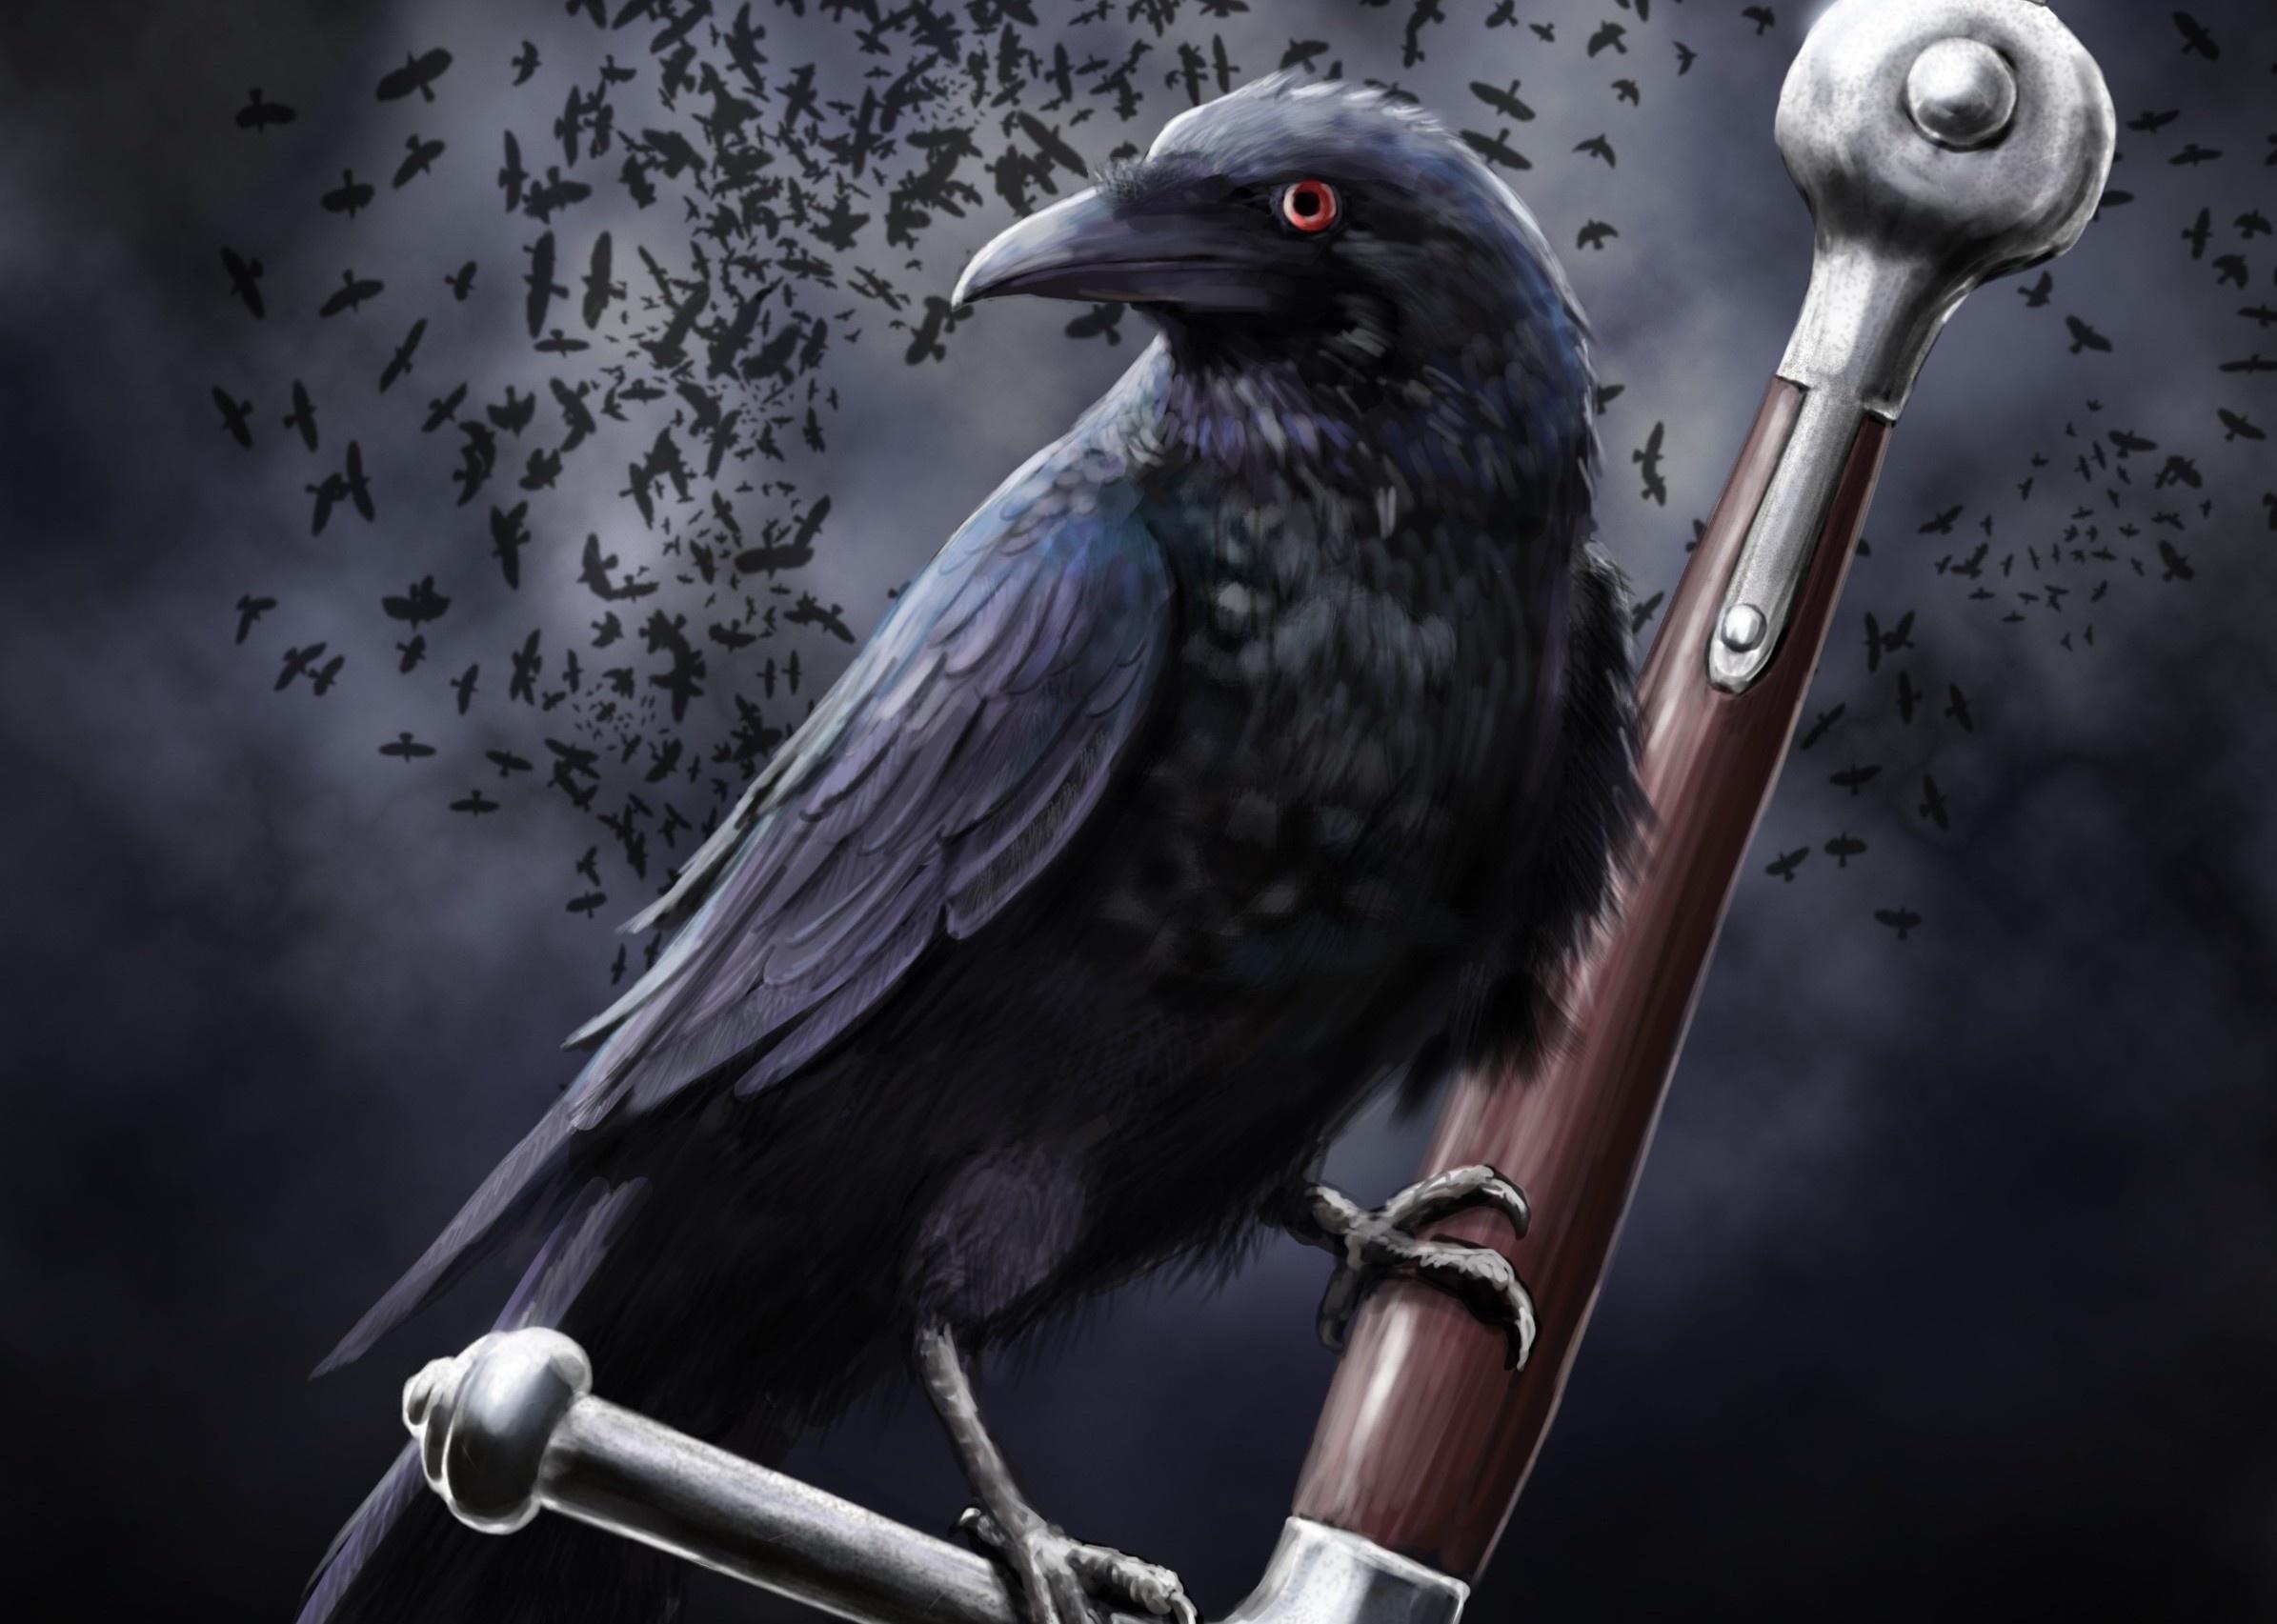 sword death dark swords weapon weapons fantasy wallpaper background 2390x1705